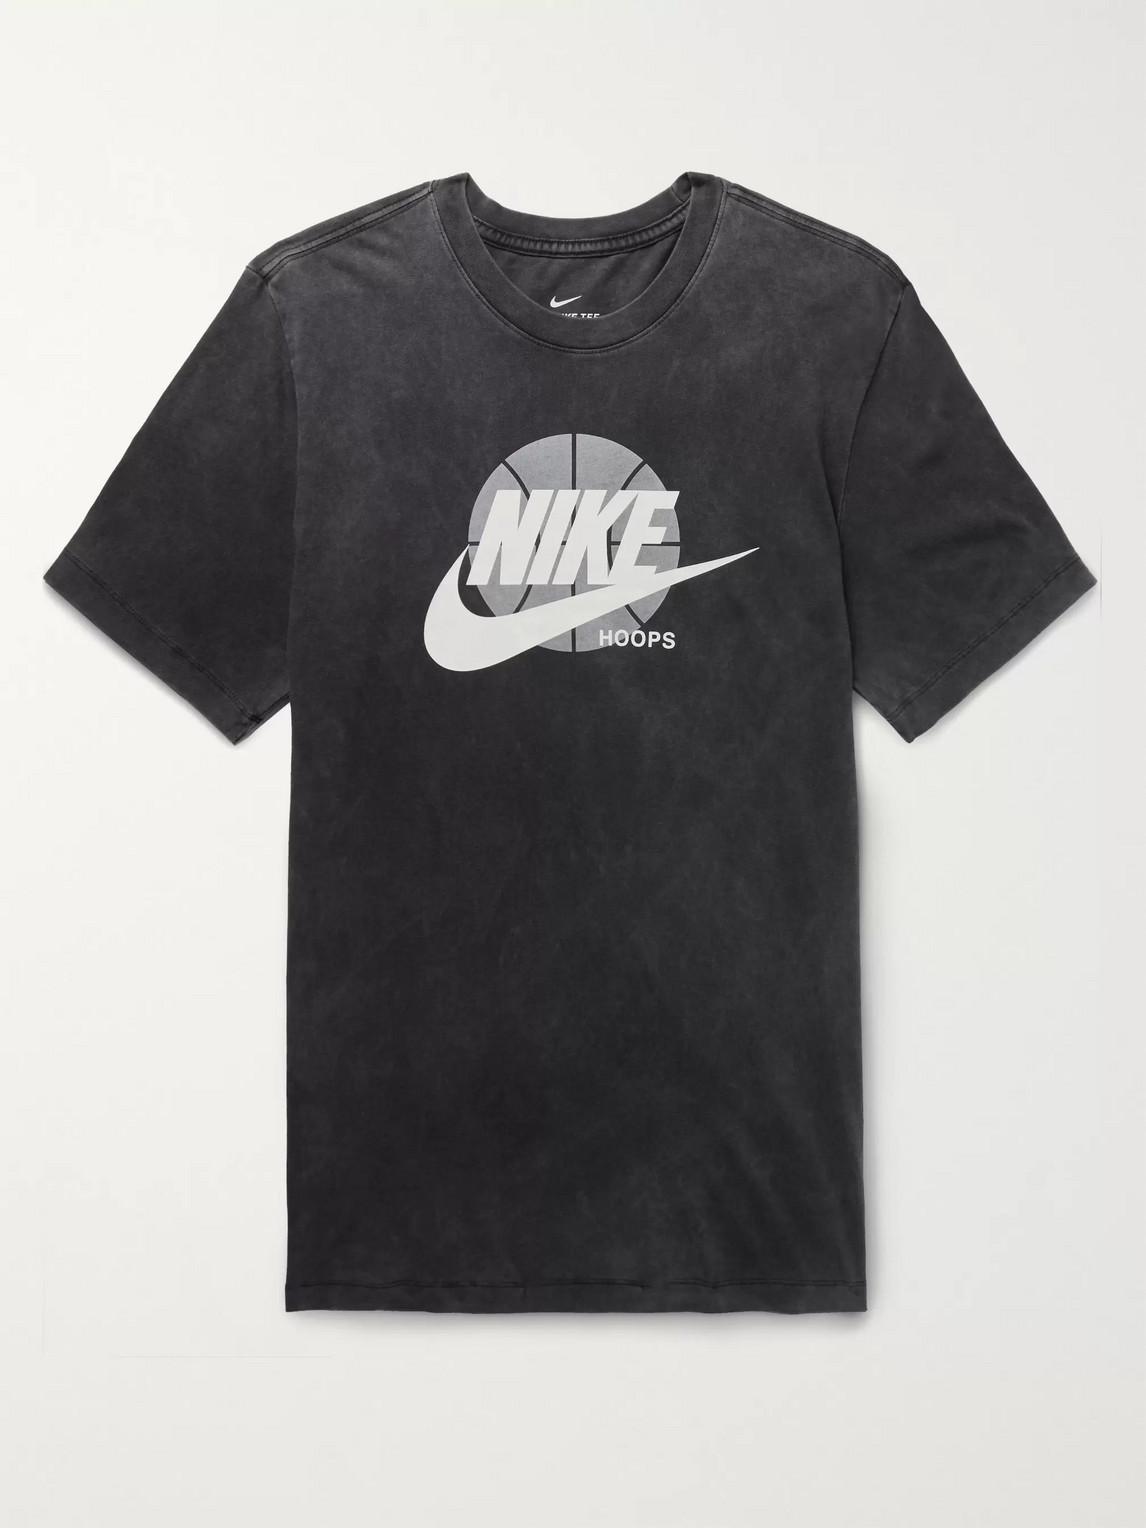 nike - futura logo-print cotton-jersey t-shirt - men - gray